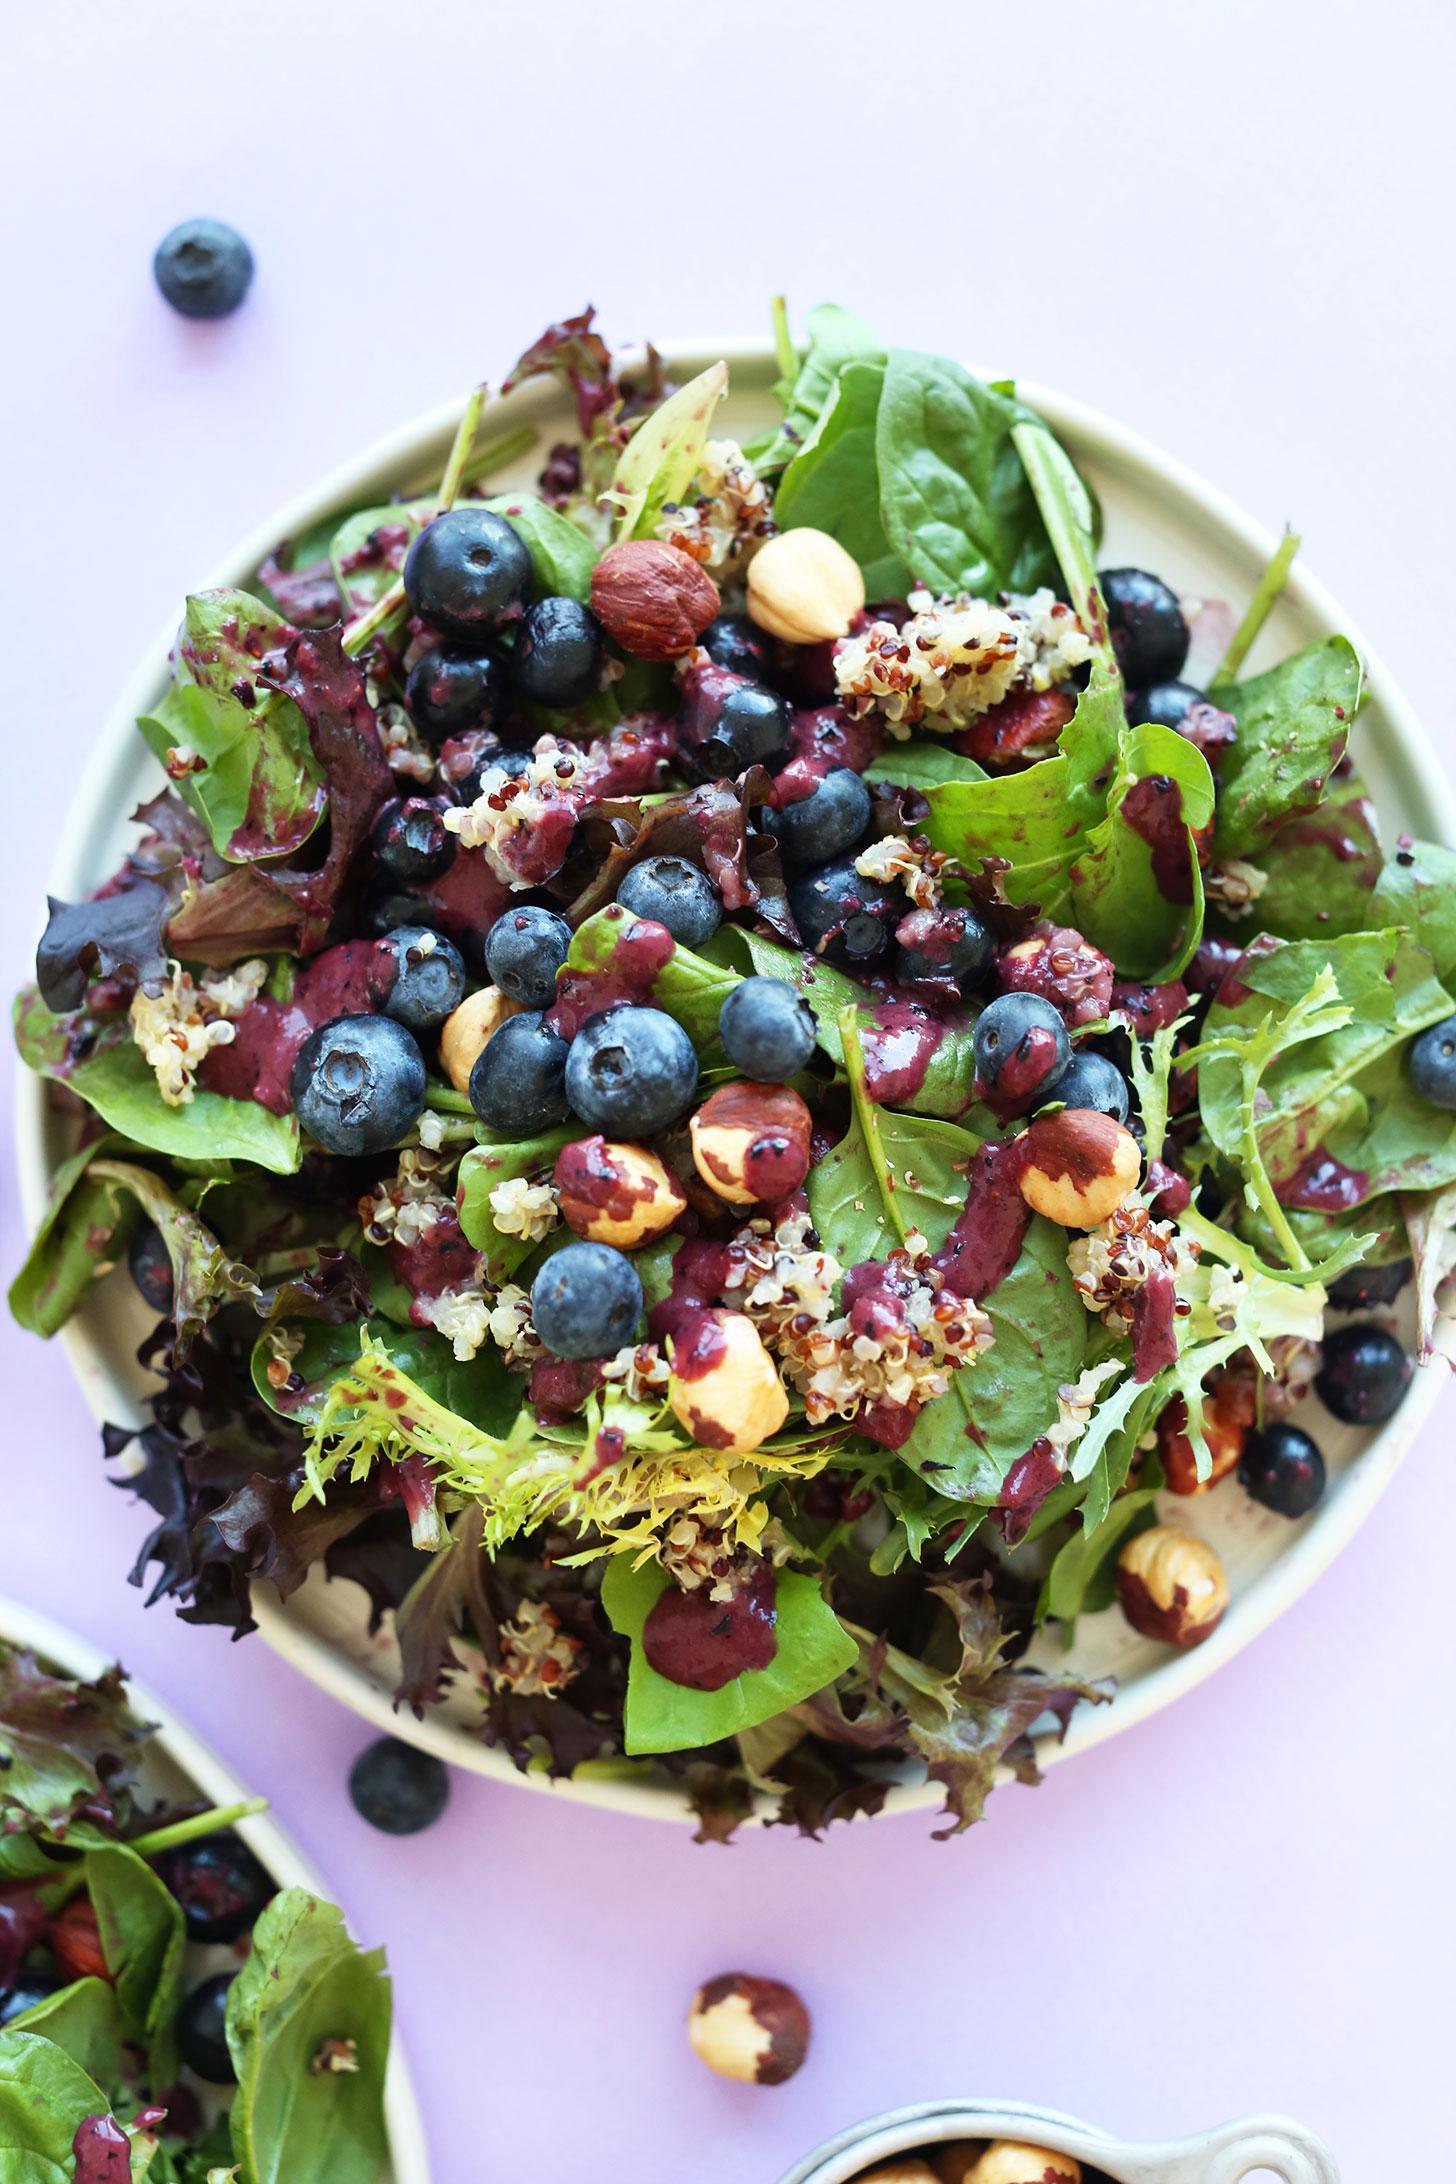 HEALTHY Blueberry Quinoa Hazelnut Salad with a Blueberry Balsamic Vinaigrette! #recipe #healthy #dinner #salad #blueberry #summer #glutenfree #vegan #minimalistbaker